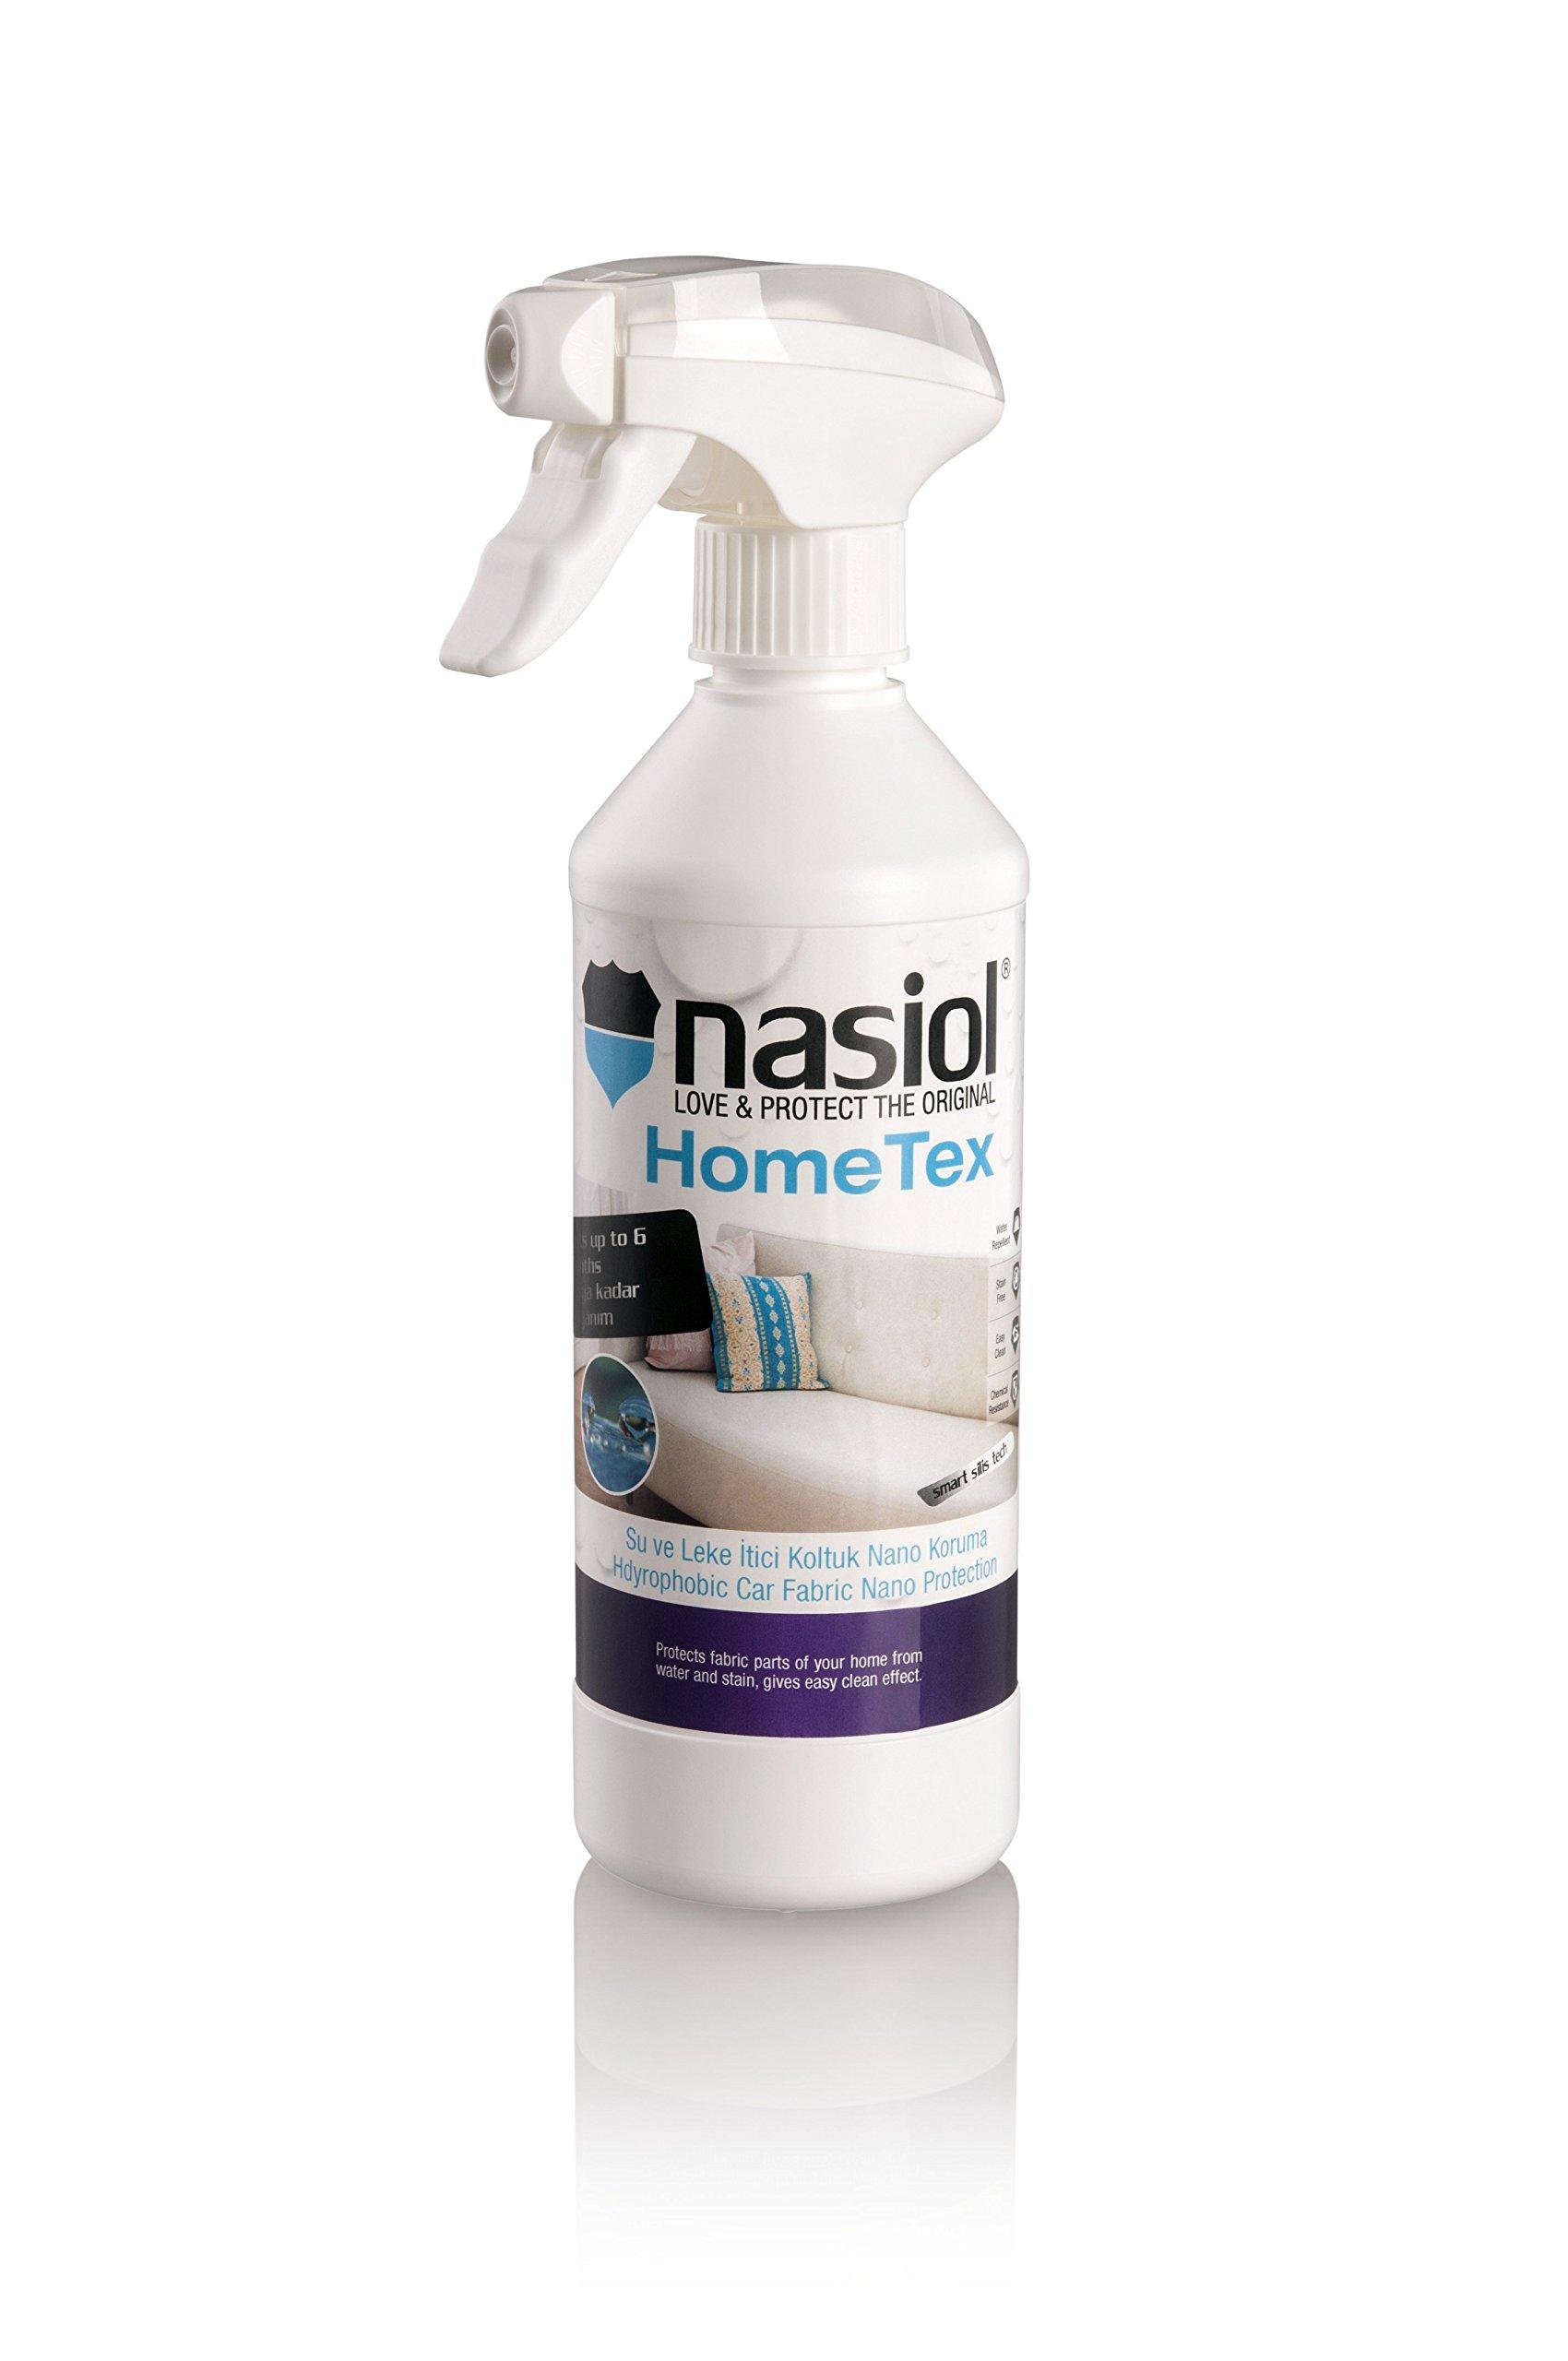 NASIOL HomeTex Home Textile Nano Protection 500 ml (17 fl. oz.)